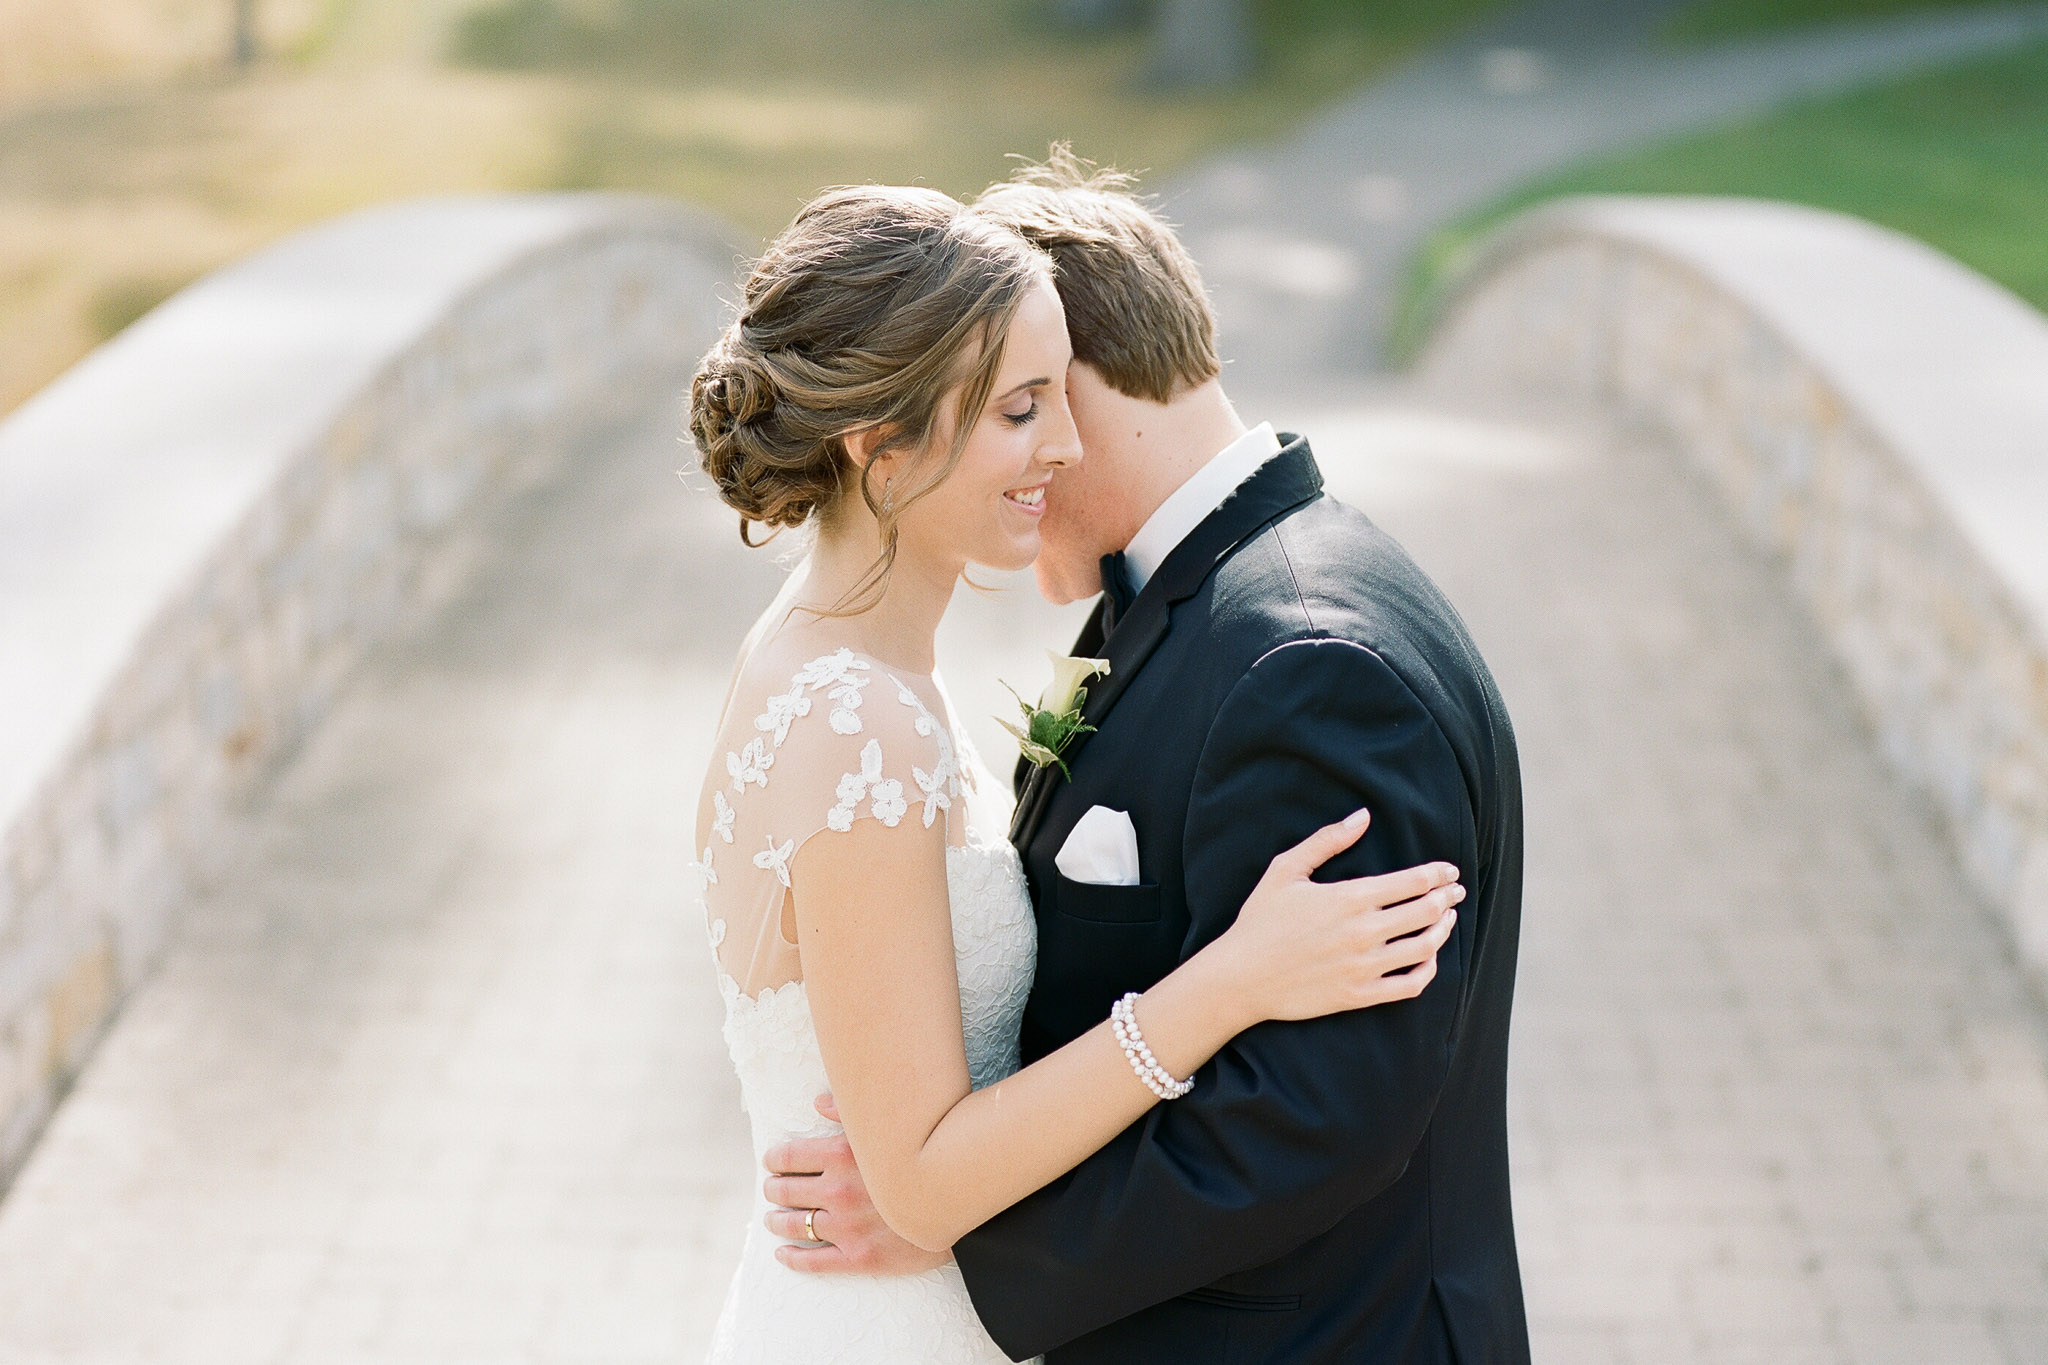 Downtown Columbus wedding photos by Columbus wedding photographer Hunter Photographic